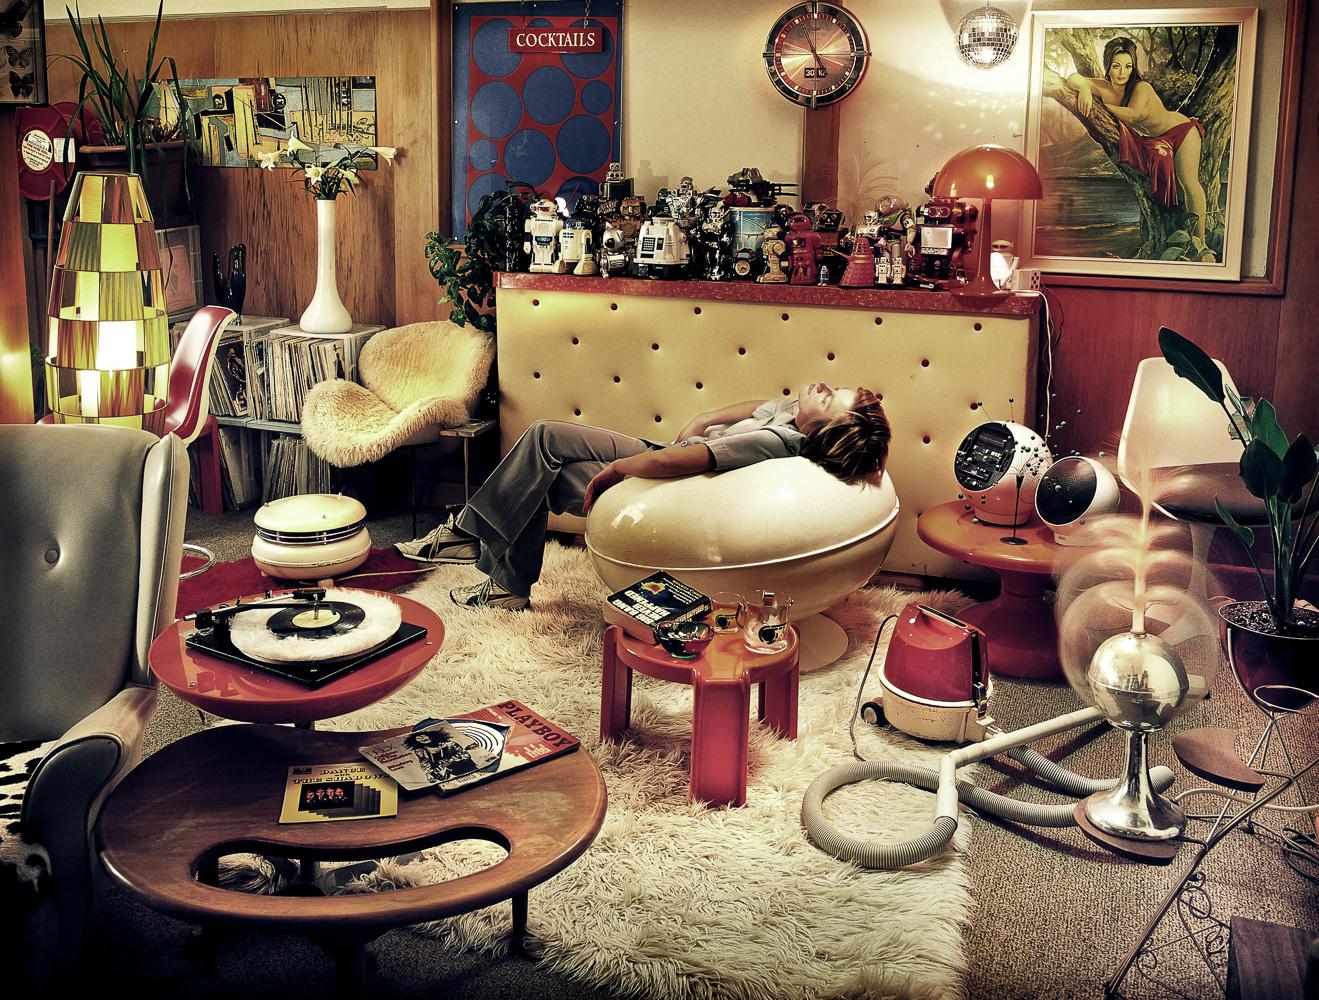 retro-furniture-Wellington-photographer-Paul-Fisher.jpg